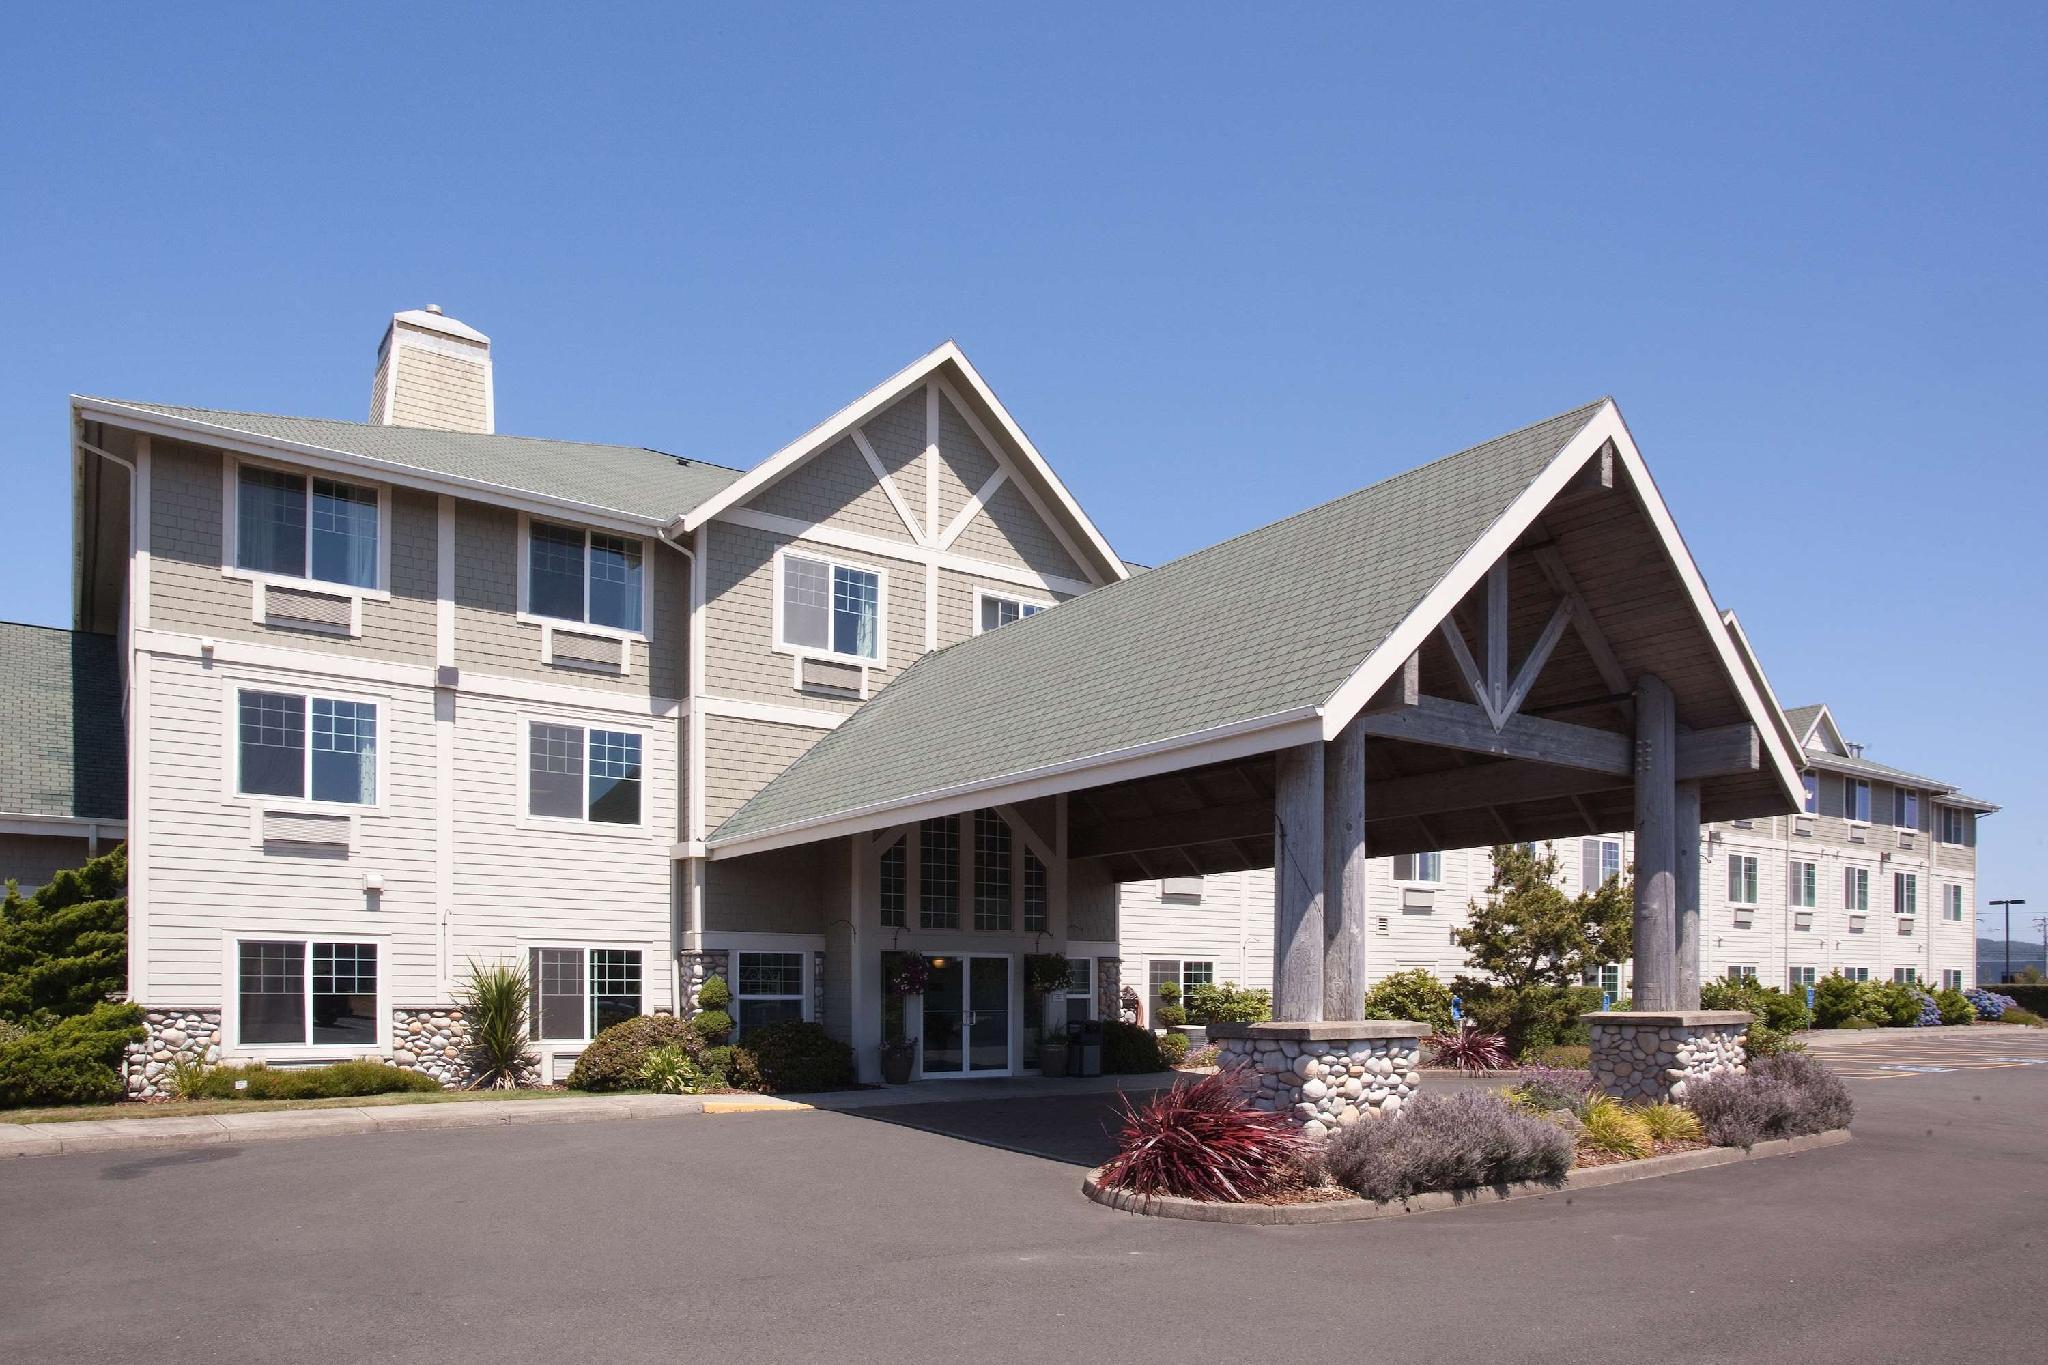 La Quinta Inn And Suites By Wyndham Newport